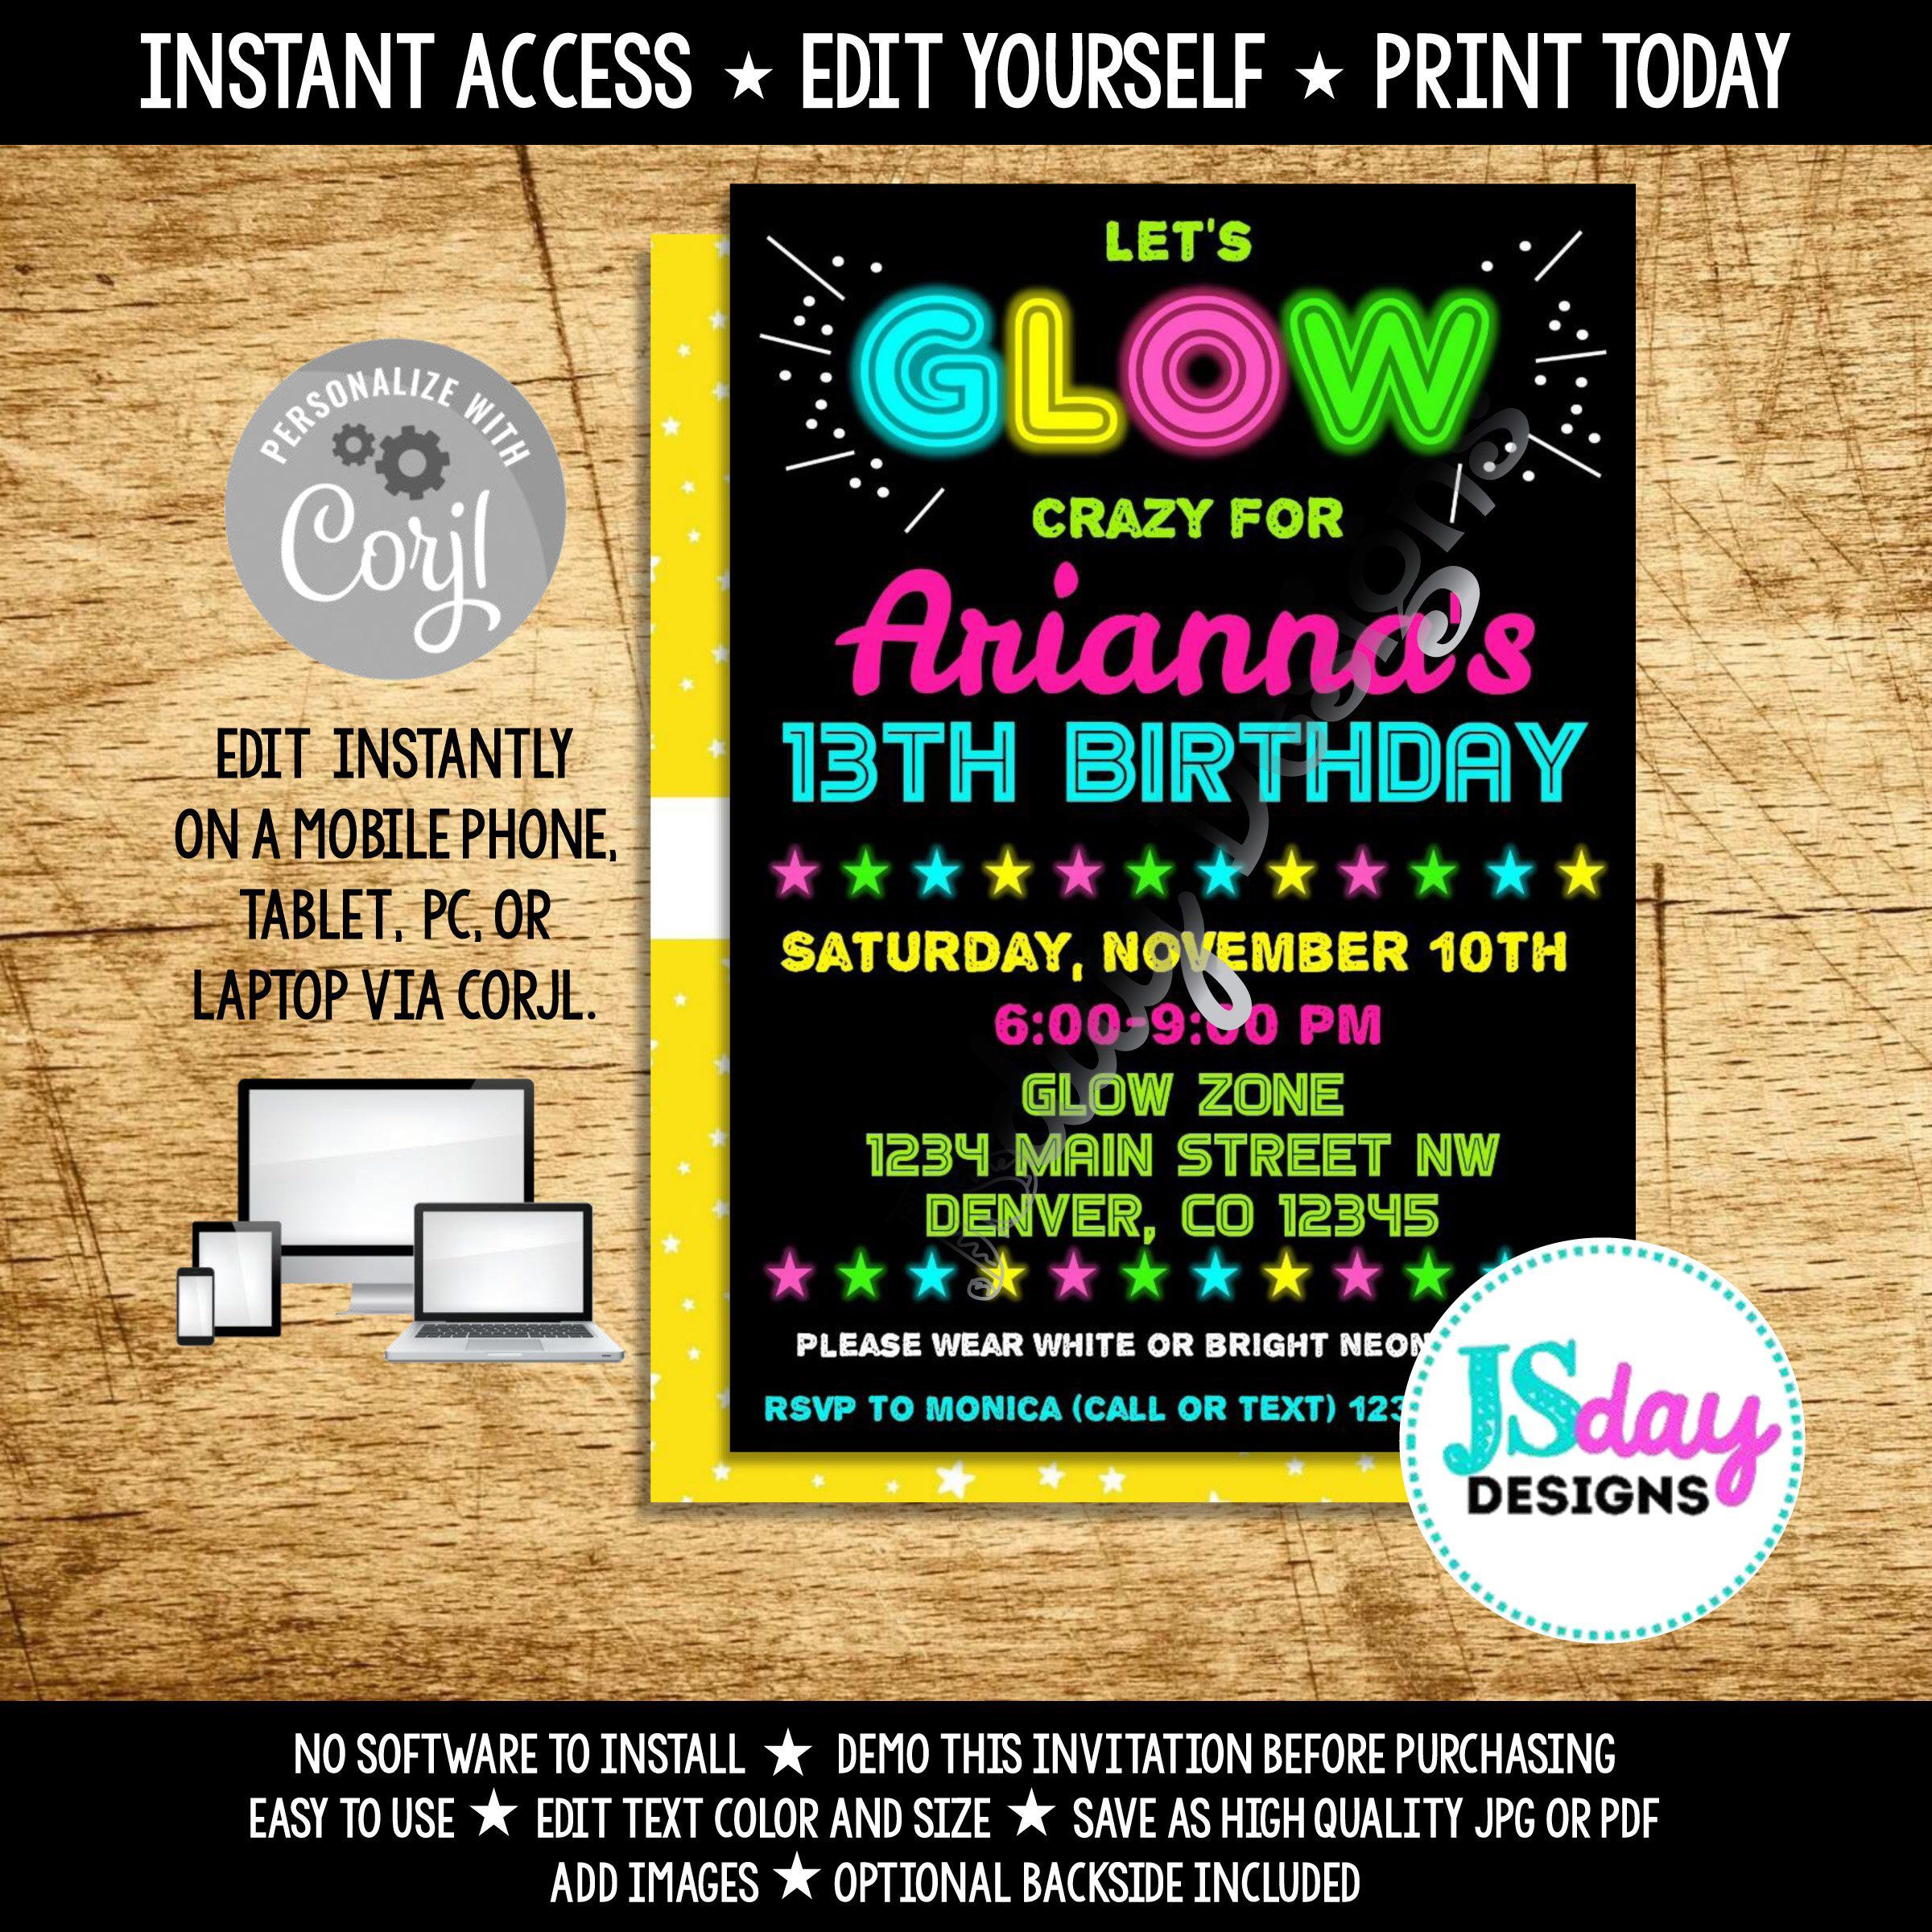 Edit Yourself Glow Crazy Birthday Invite In The Dark Party Neon Black Light Invitation DIY Corjl Instant Download Tween